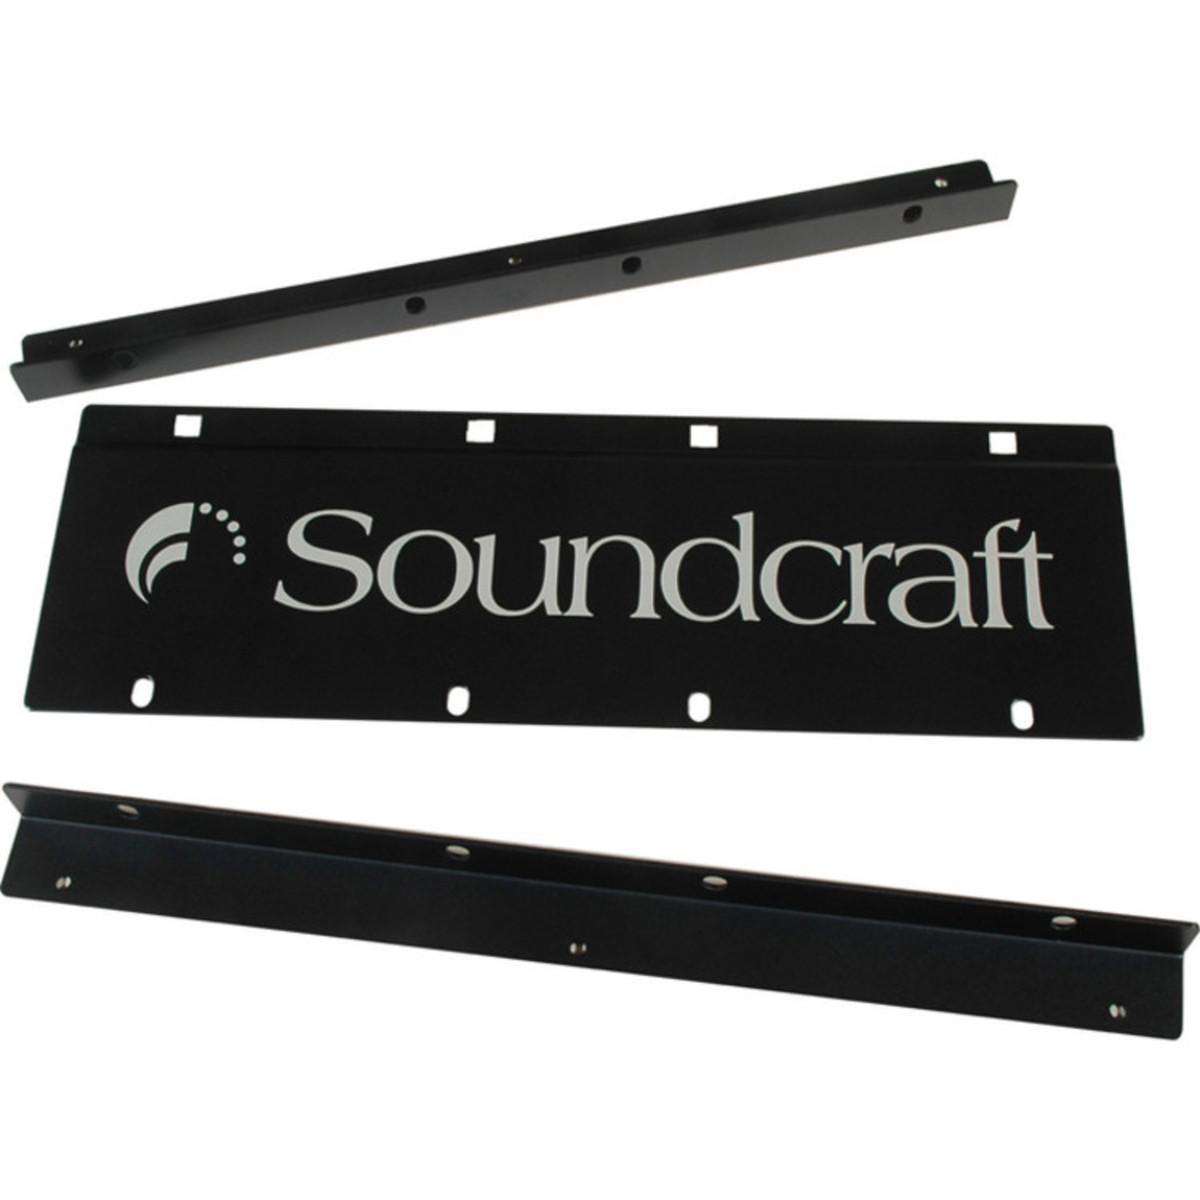 Soundcraft Epm8 Efx8 Rackmount Kit At Gear4music